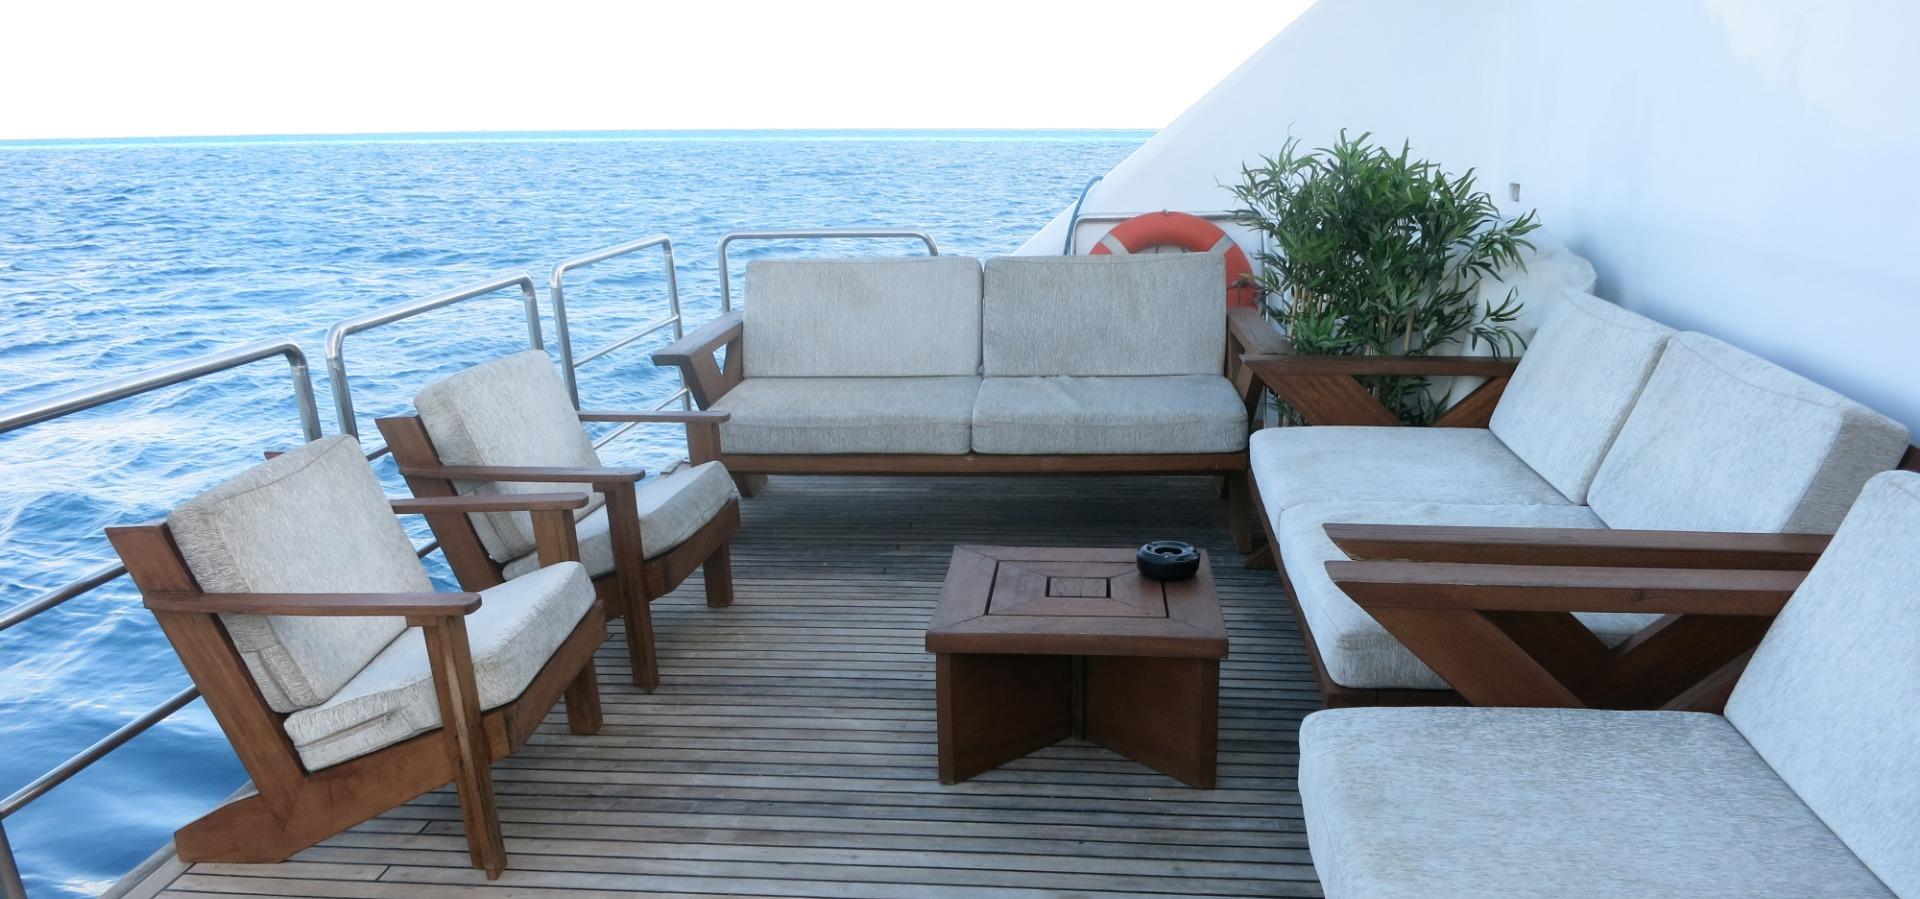 stern deck, blue Voyager, Maldives